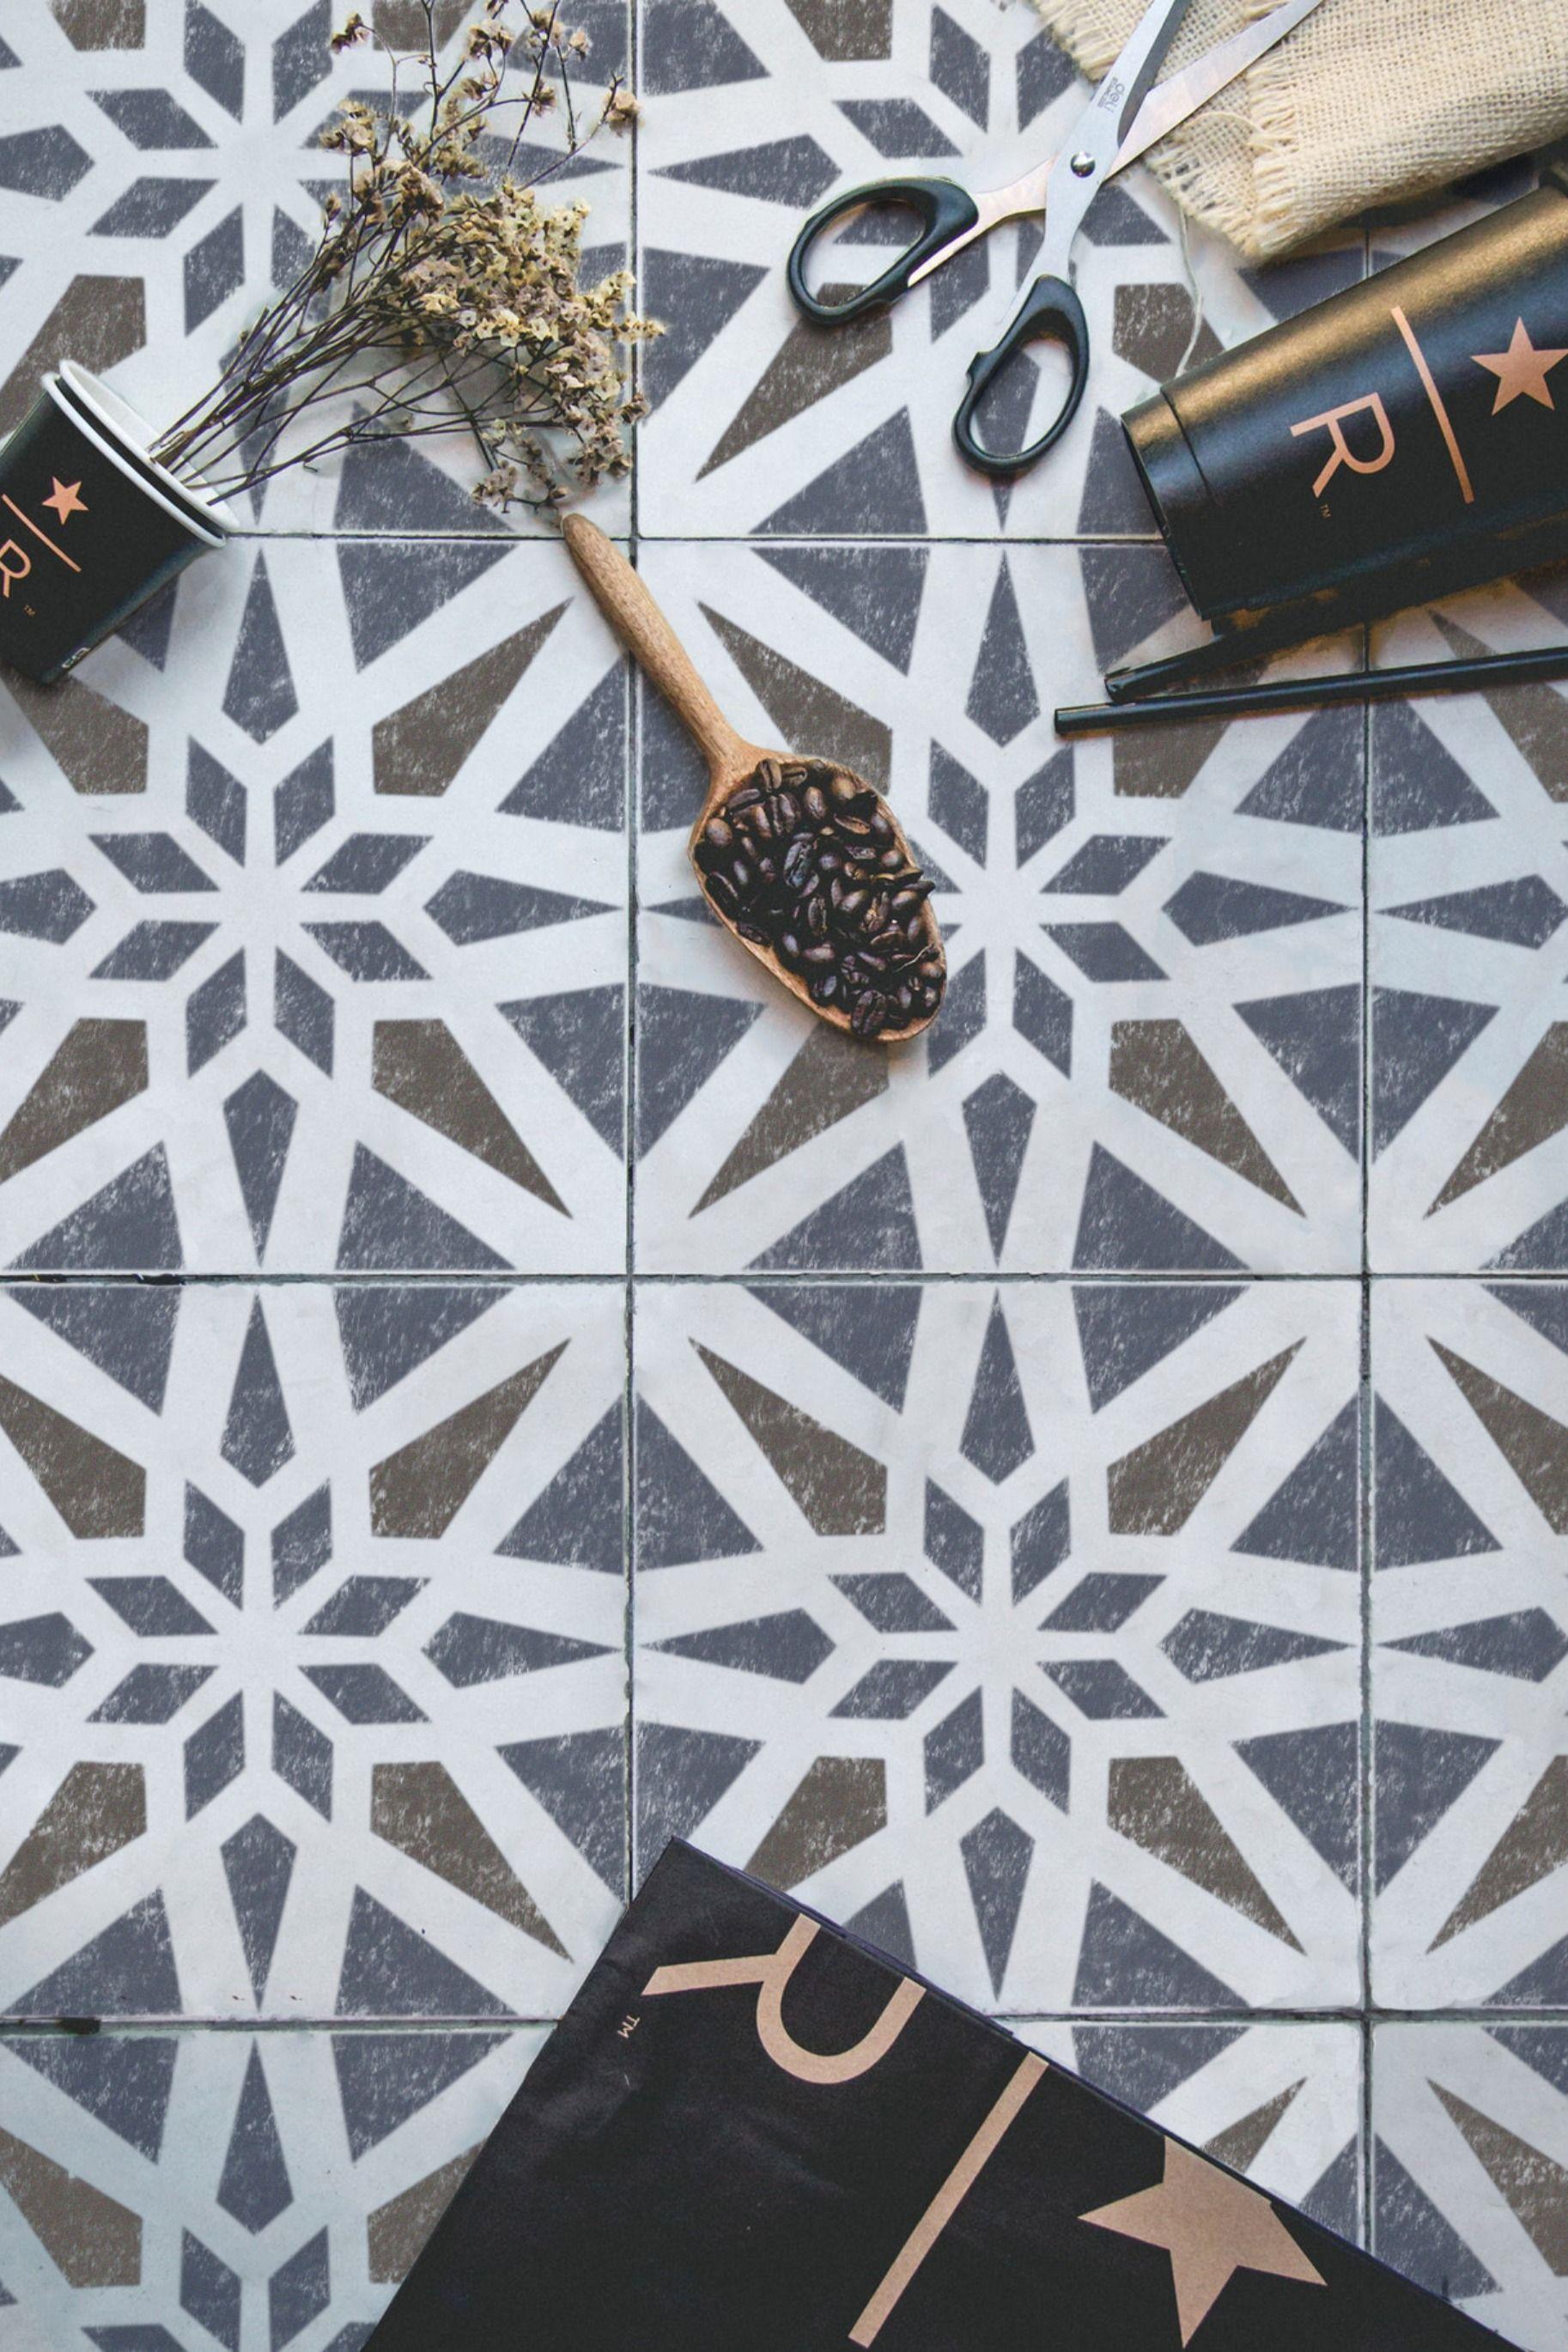 Modern Geometric Tile Stencil Tile Stencil Geometric Tiles Floor Stencils Patterns